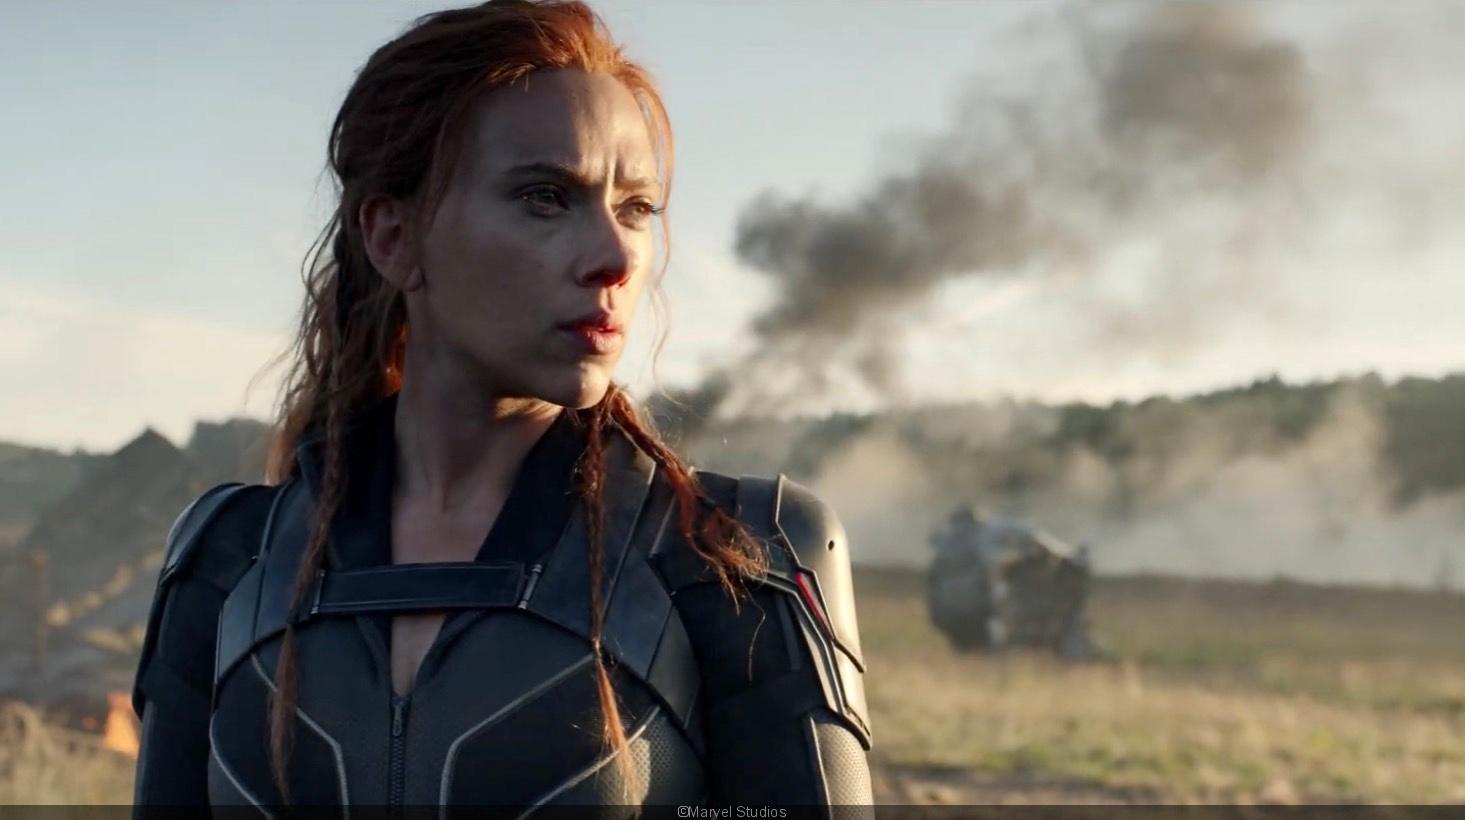 Natasha Romanoff (Scarlett Johansson) - Black Widow